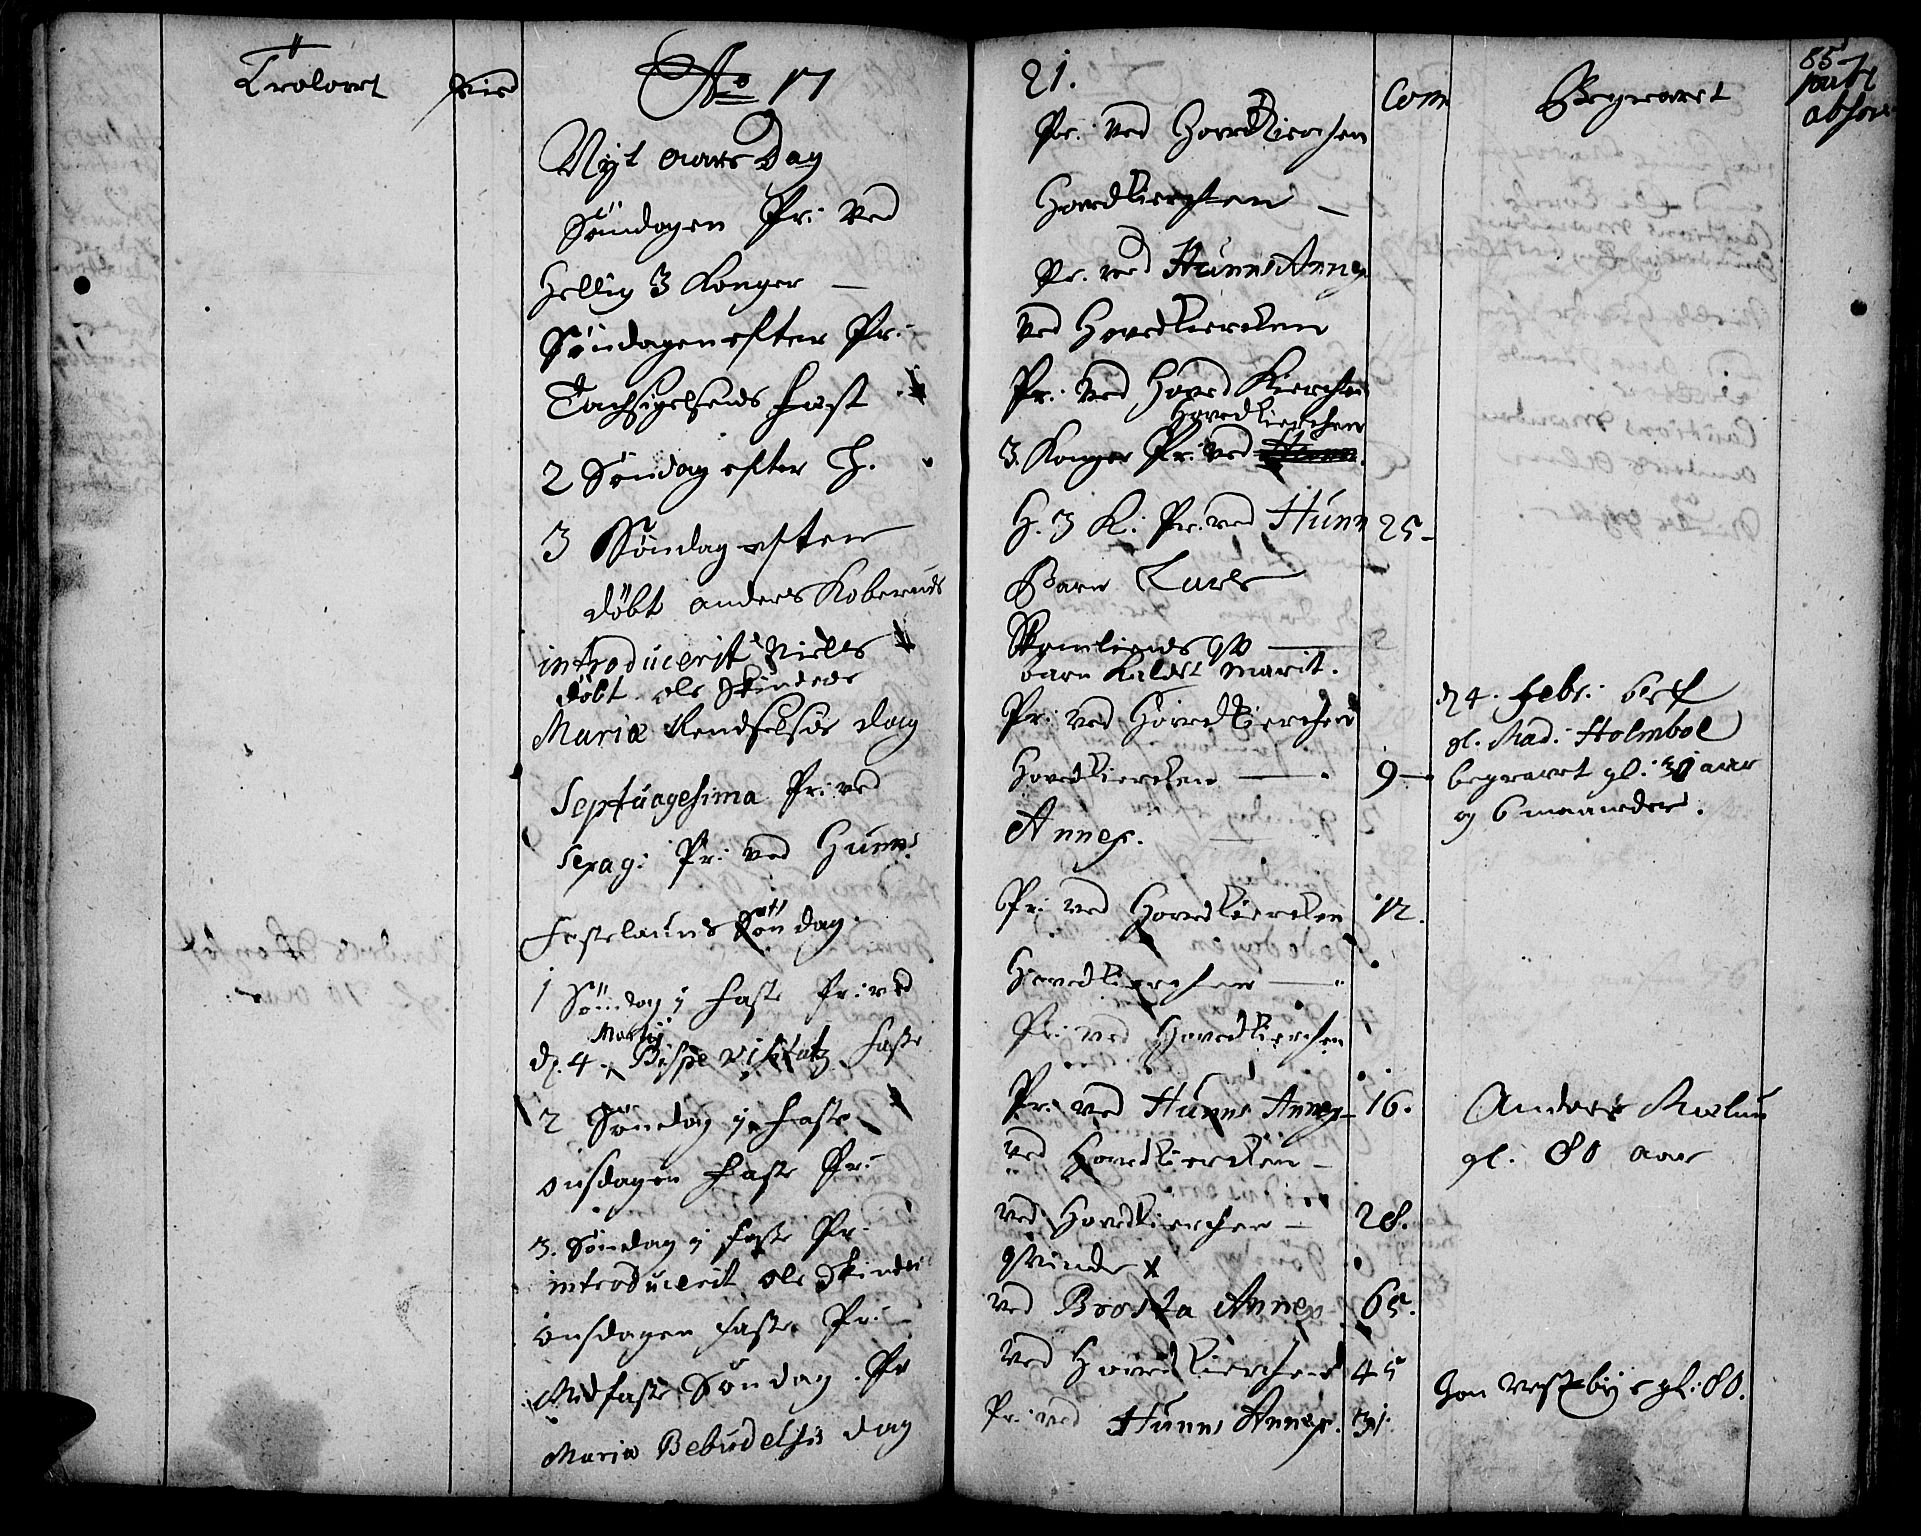 SAH, Vardal prestekontor, H/Ha/Haa/L0001: Ministerialbok nr. 1, 1706-1748, s. 85